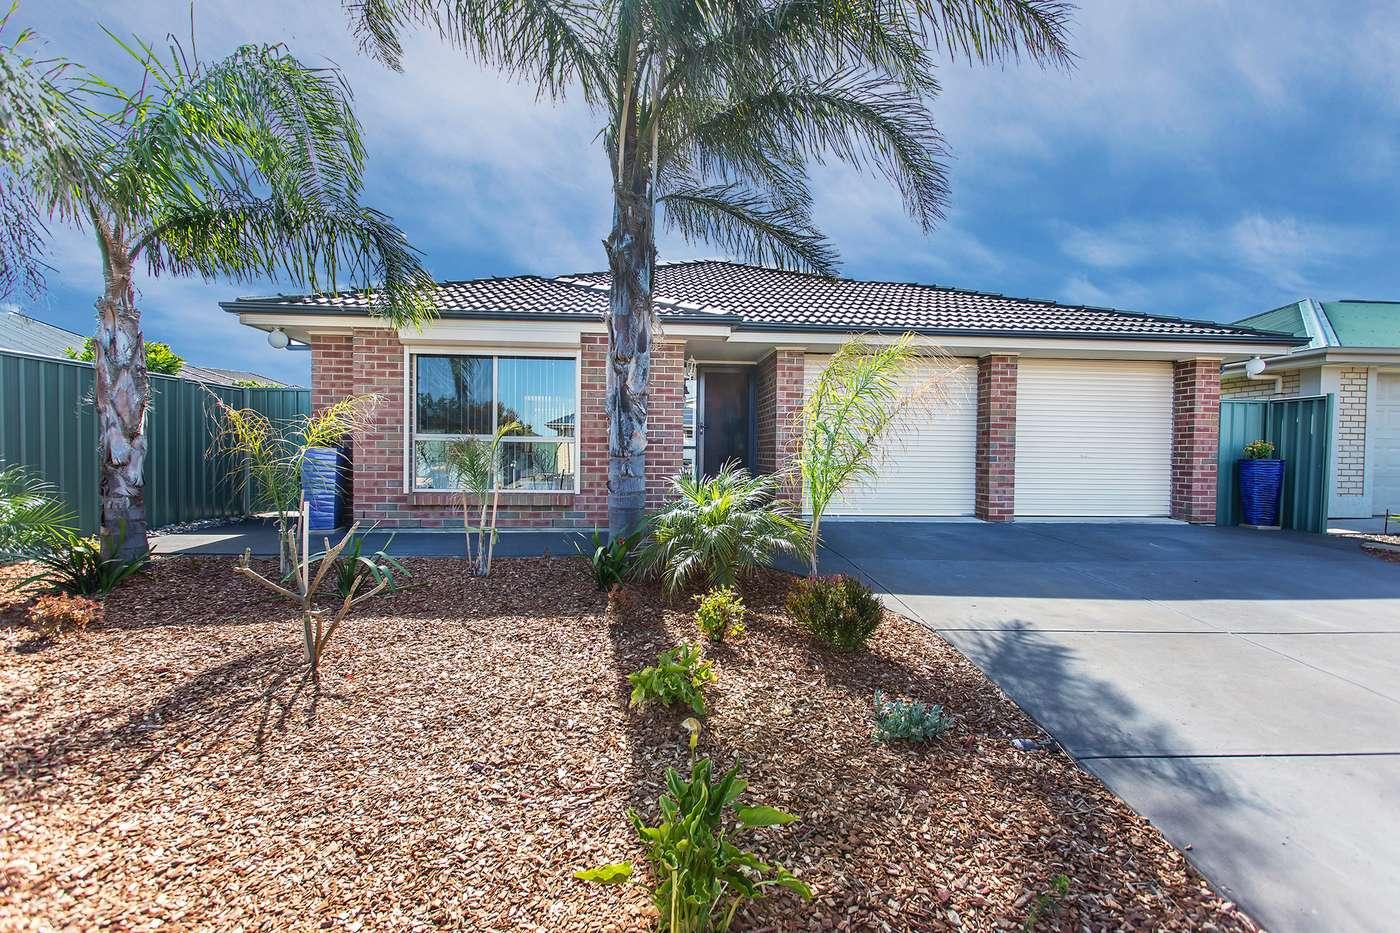 Main view of Homely house listing, 3 Seagreen Way, Aldinga Beach, SA 5173